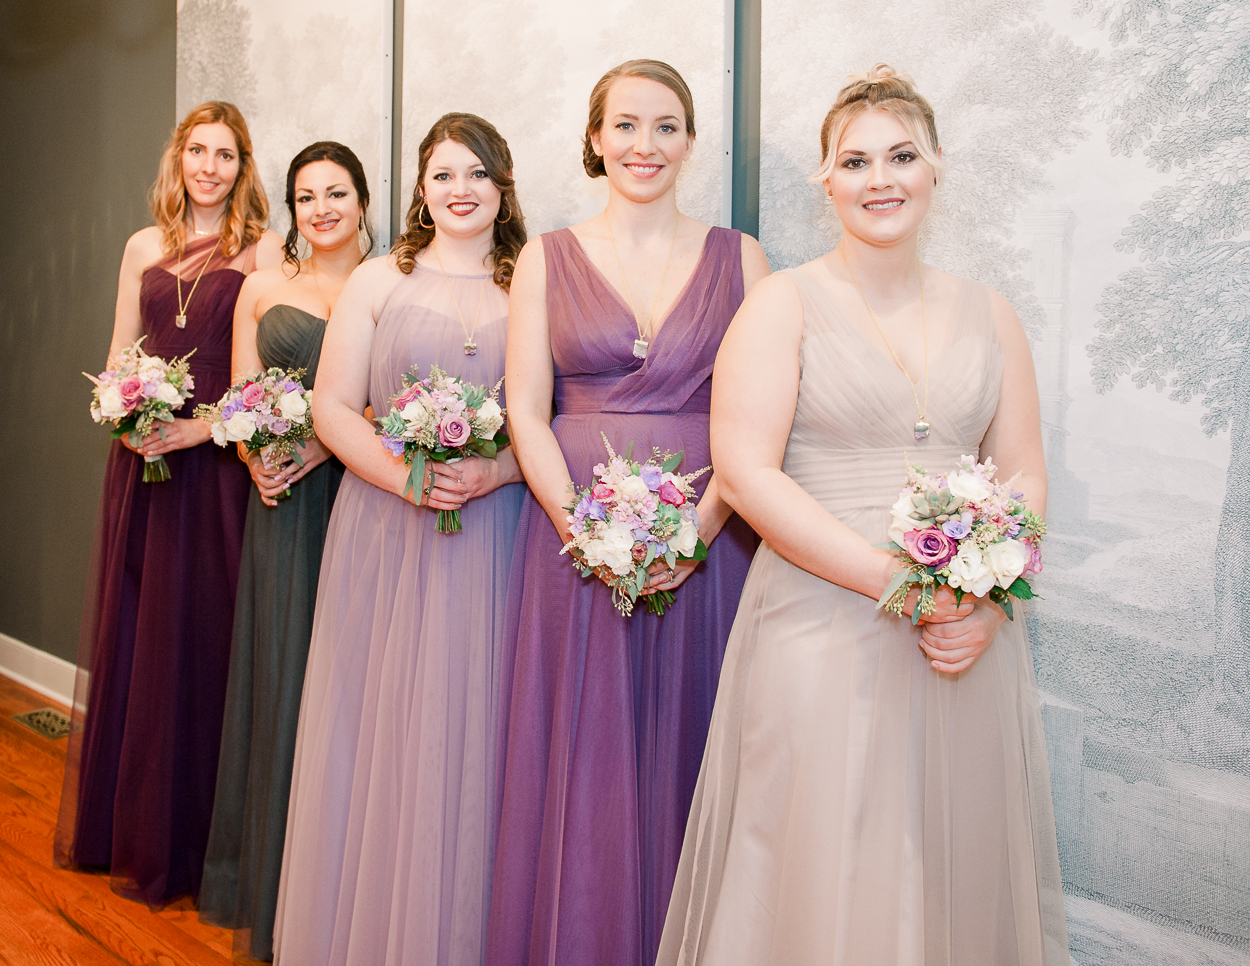 BigCork_vineyard wedding_virginiaweddingphotographer_youseephotography_SarahJames (9).JPG